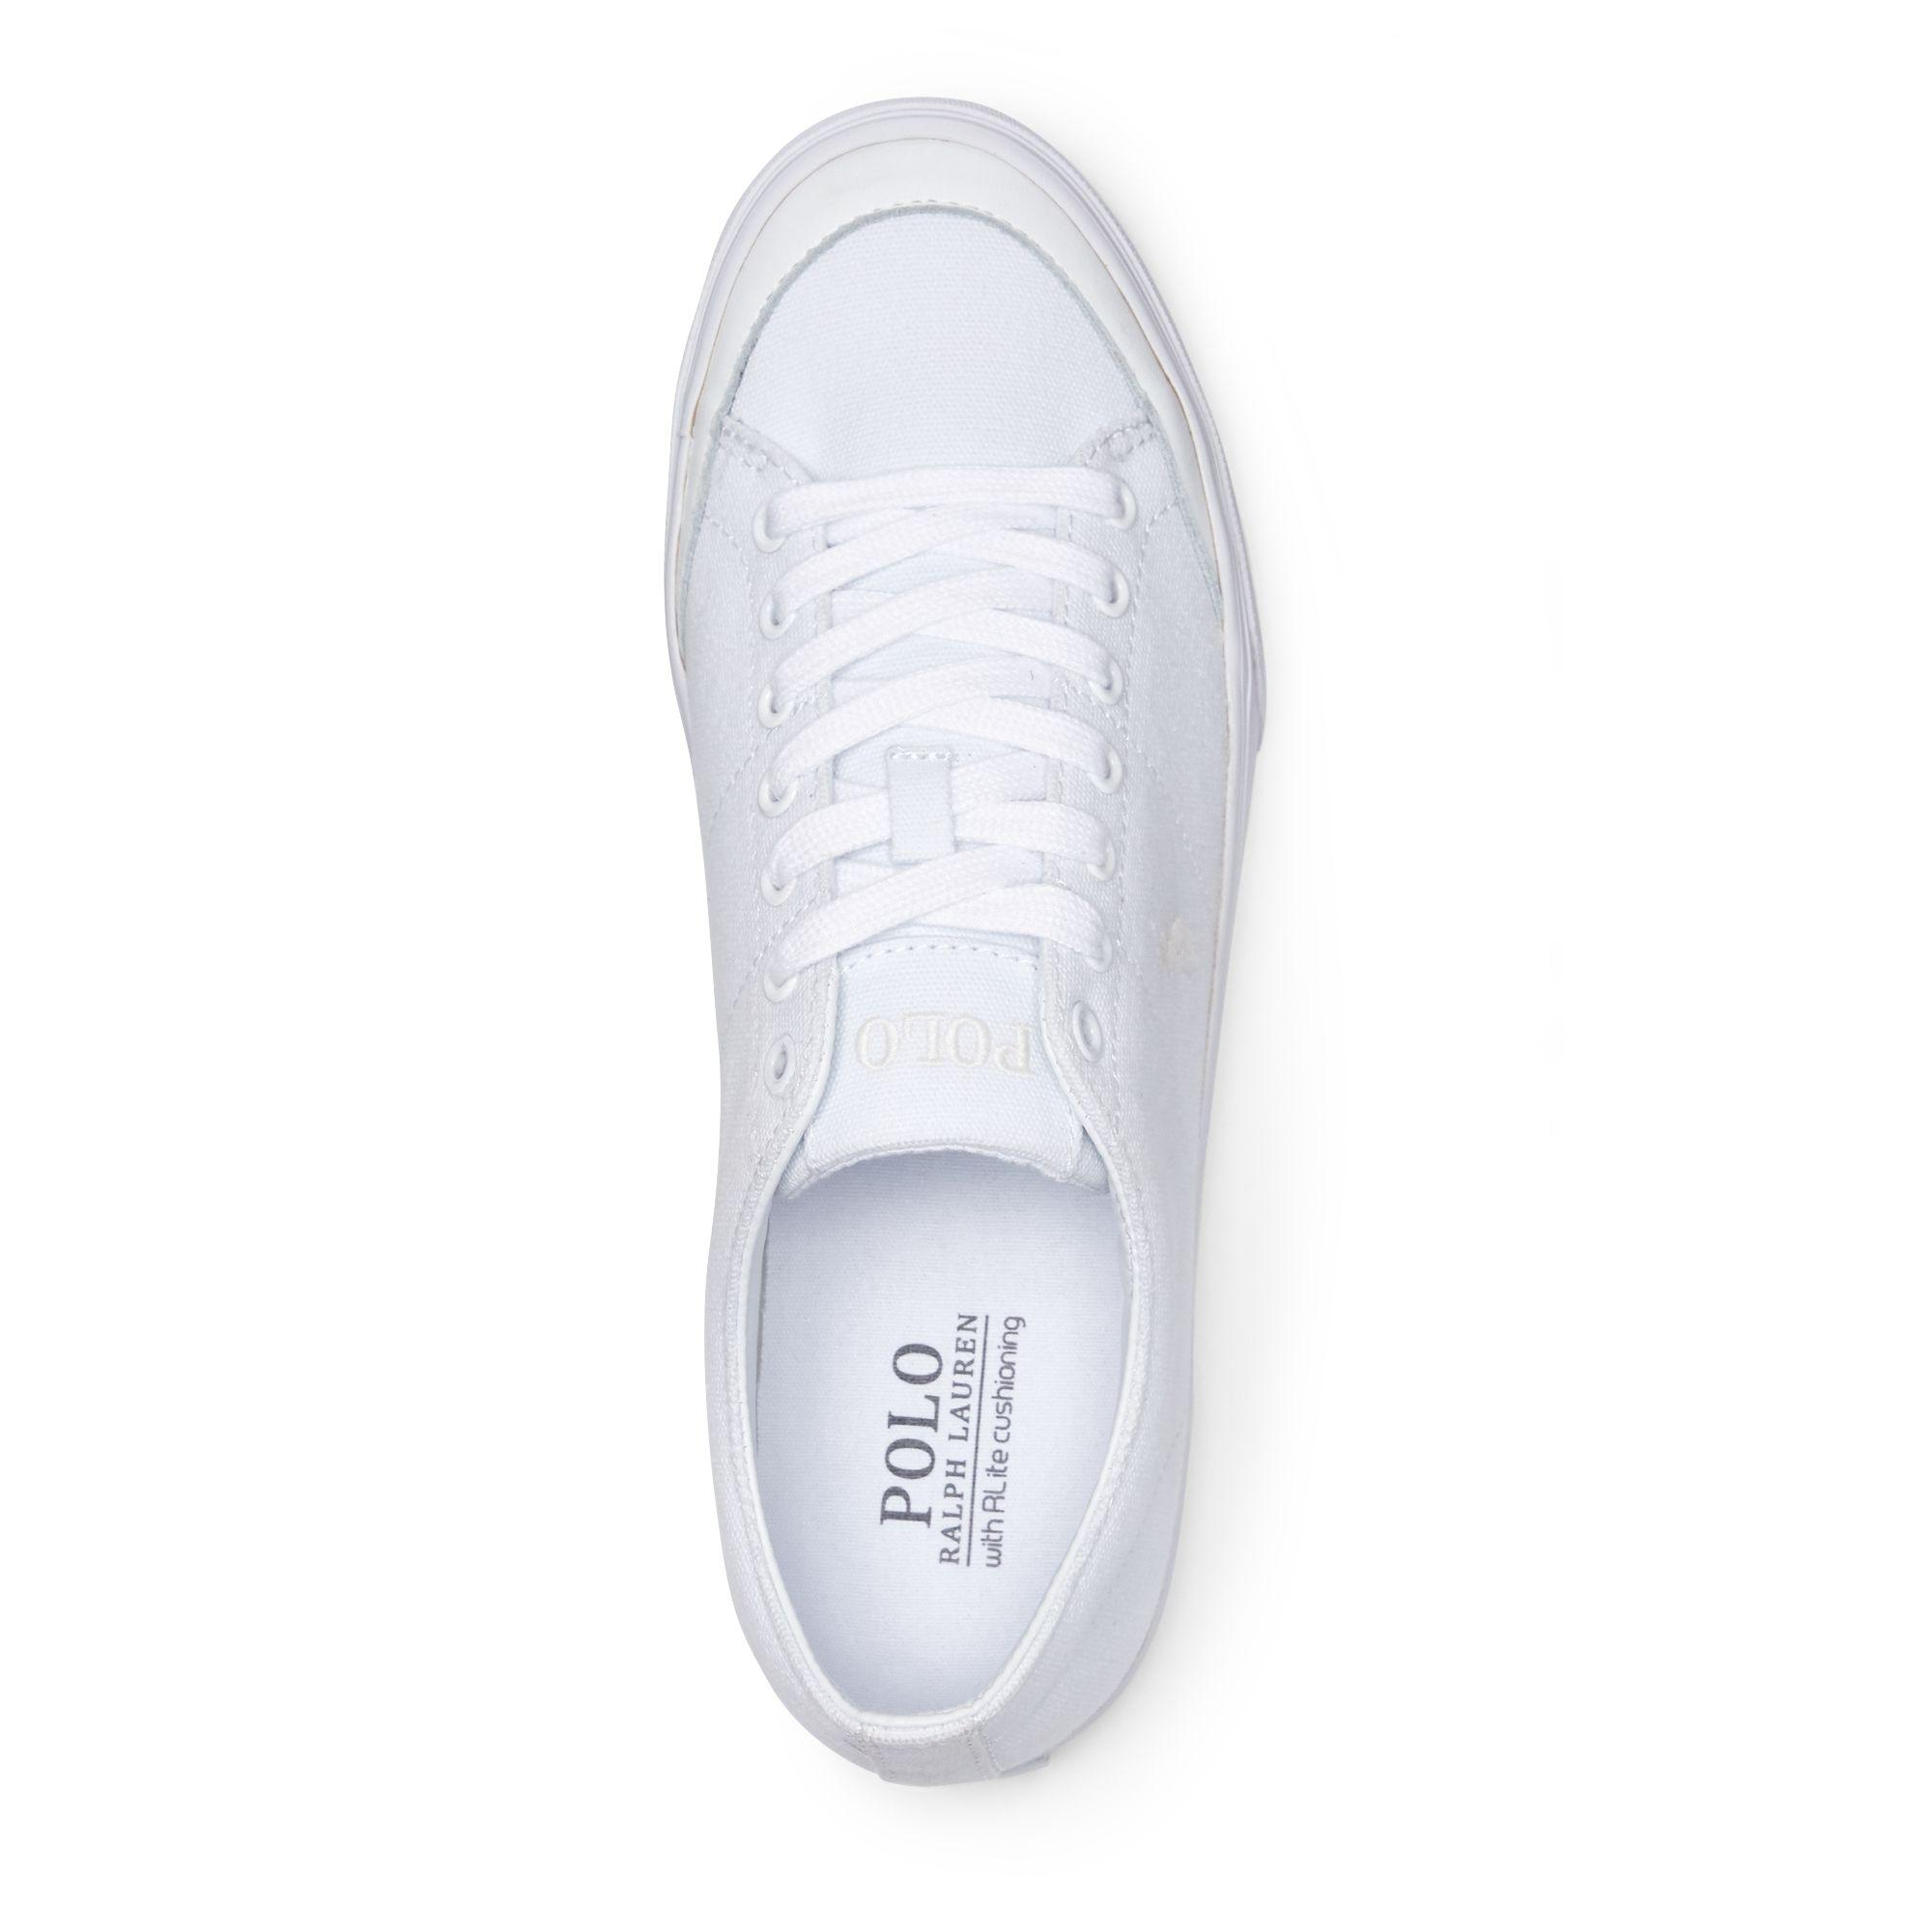 Weiß Low Canvas Top Sneaker Sherwin strdhCQ